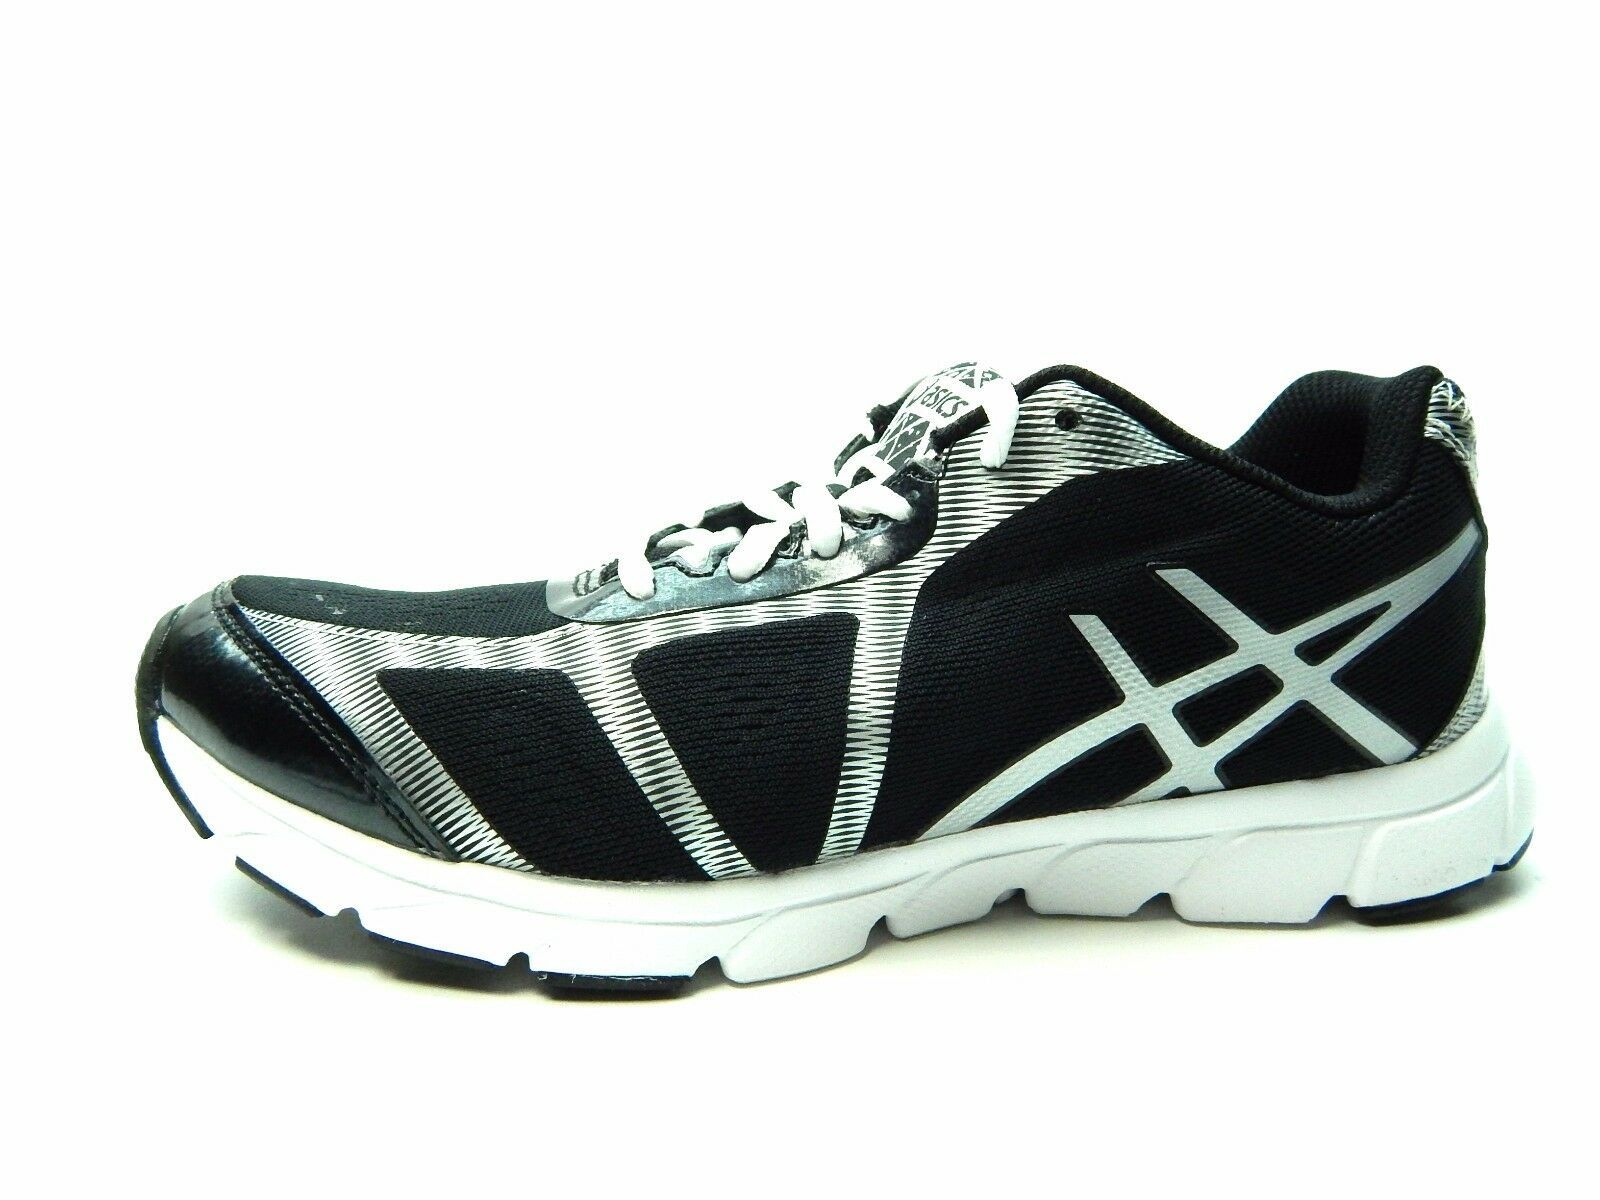 ASICS GEL HAVOC 2 BLACK LIGHTNING SIZE Weiß ATHLETIC MEN Schuhe SIZE LIGHTNING 7 & 8.5 36c5e2